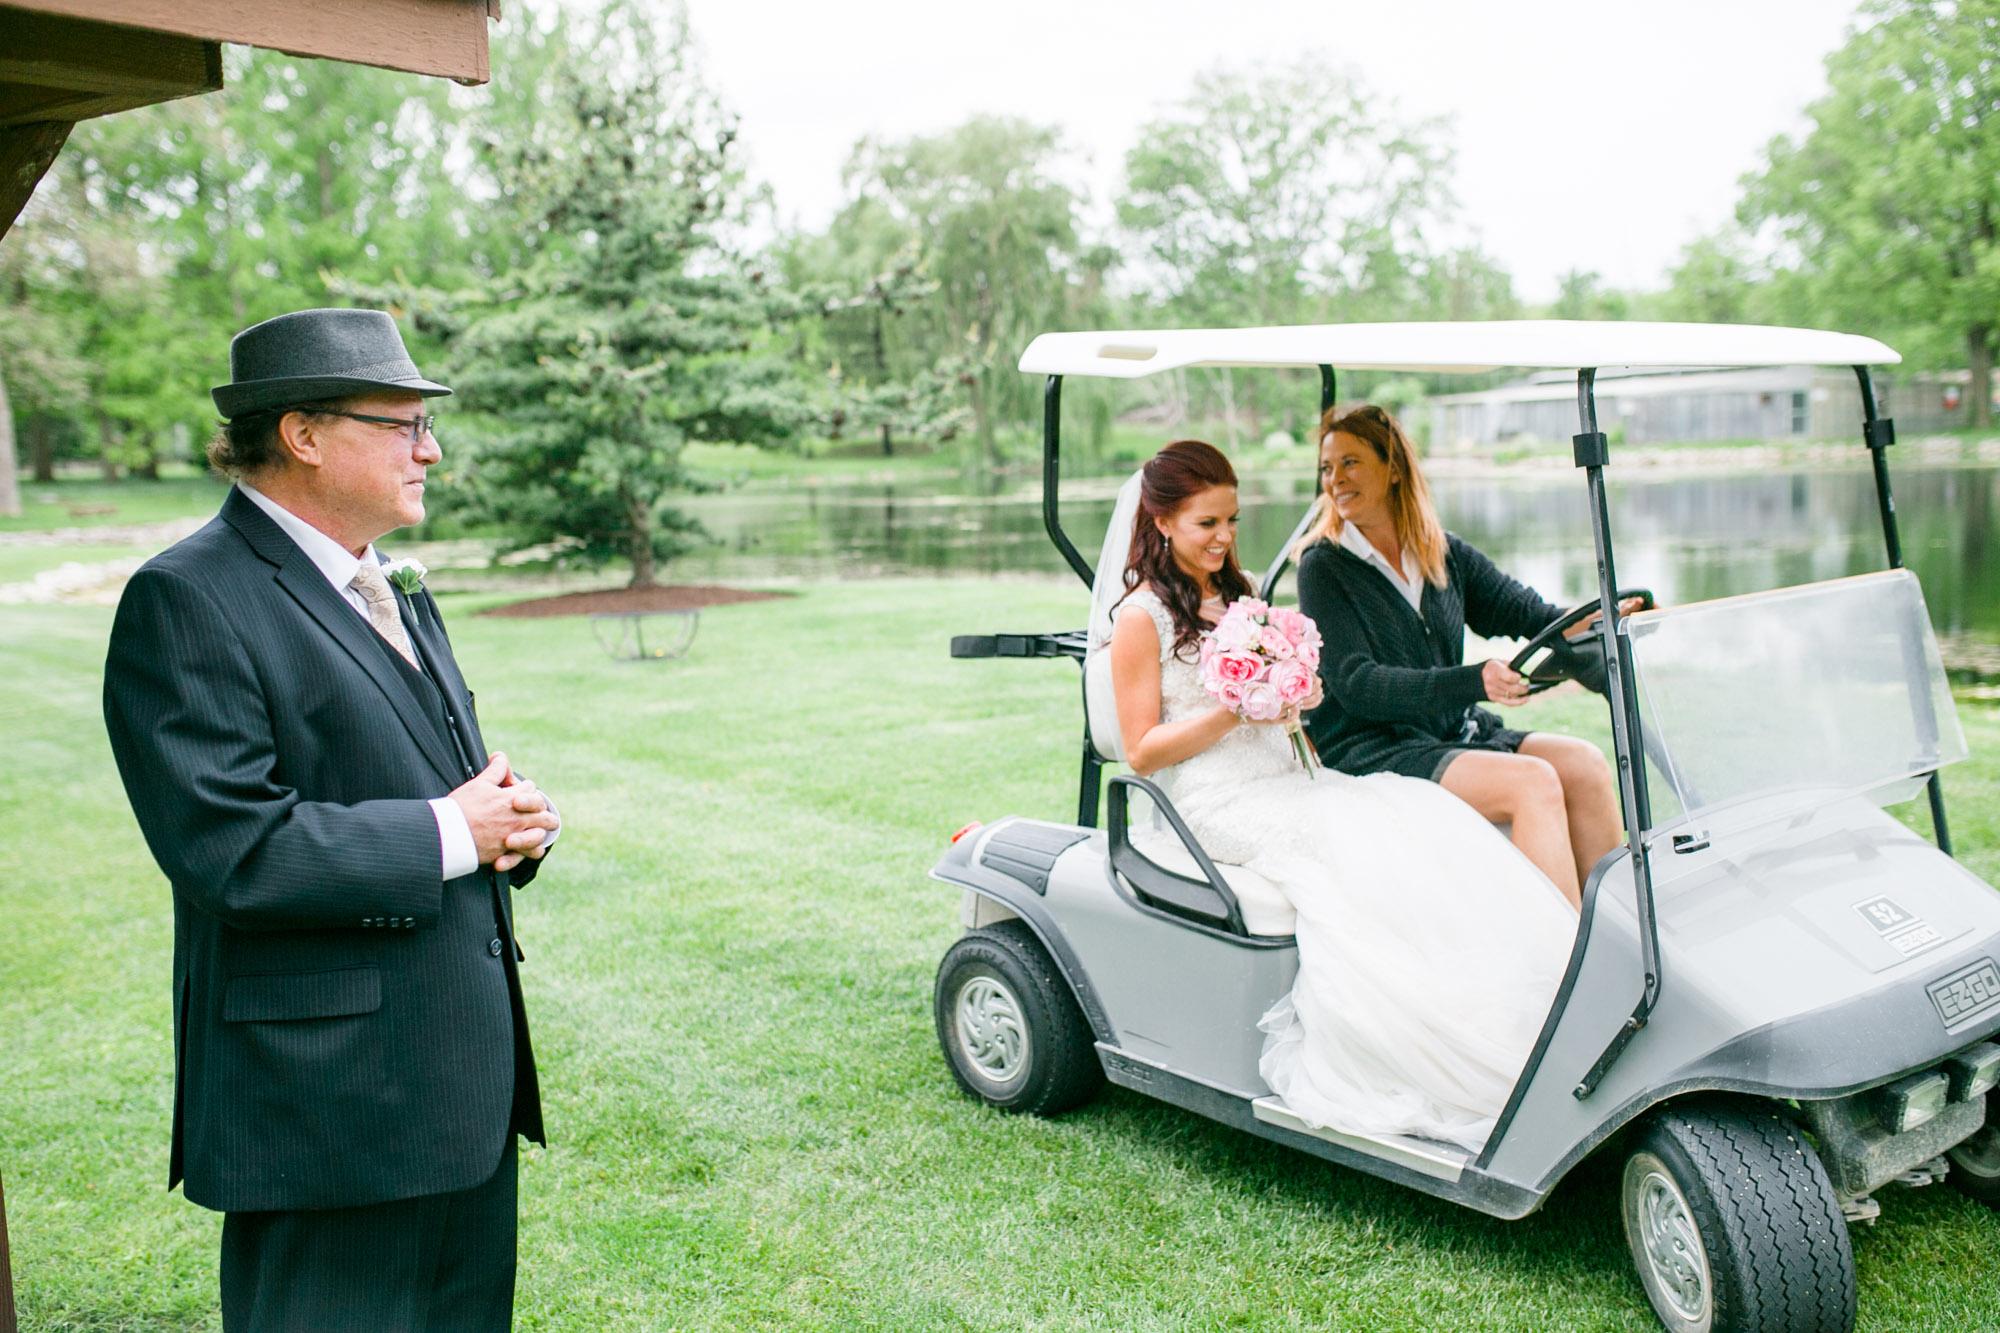 hensville-wedding-downtown-toledo-ohio (26 of 103).jpg